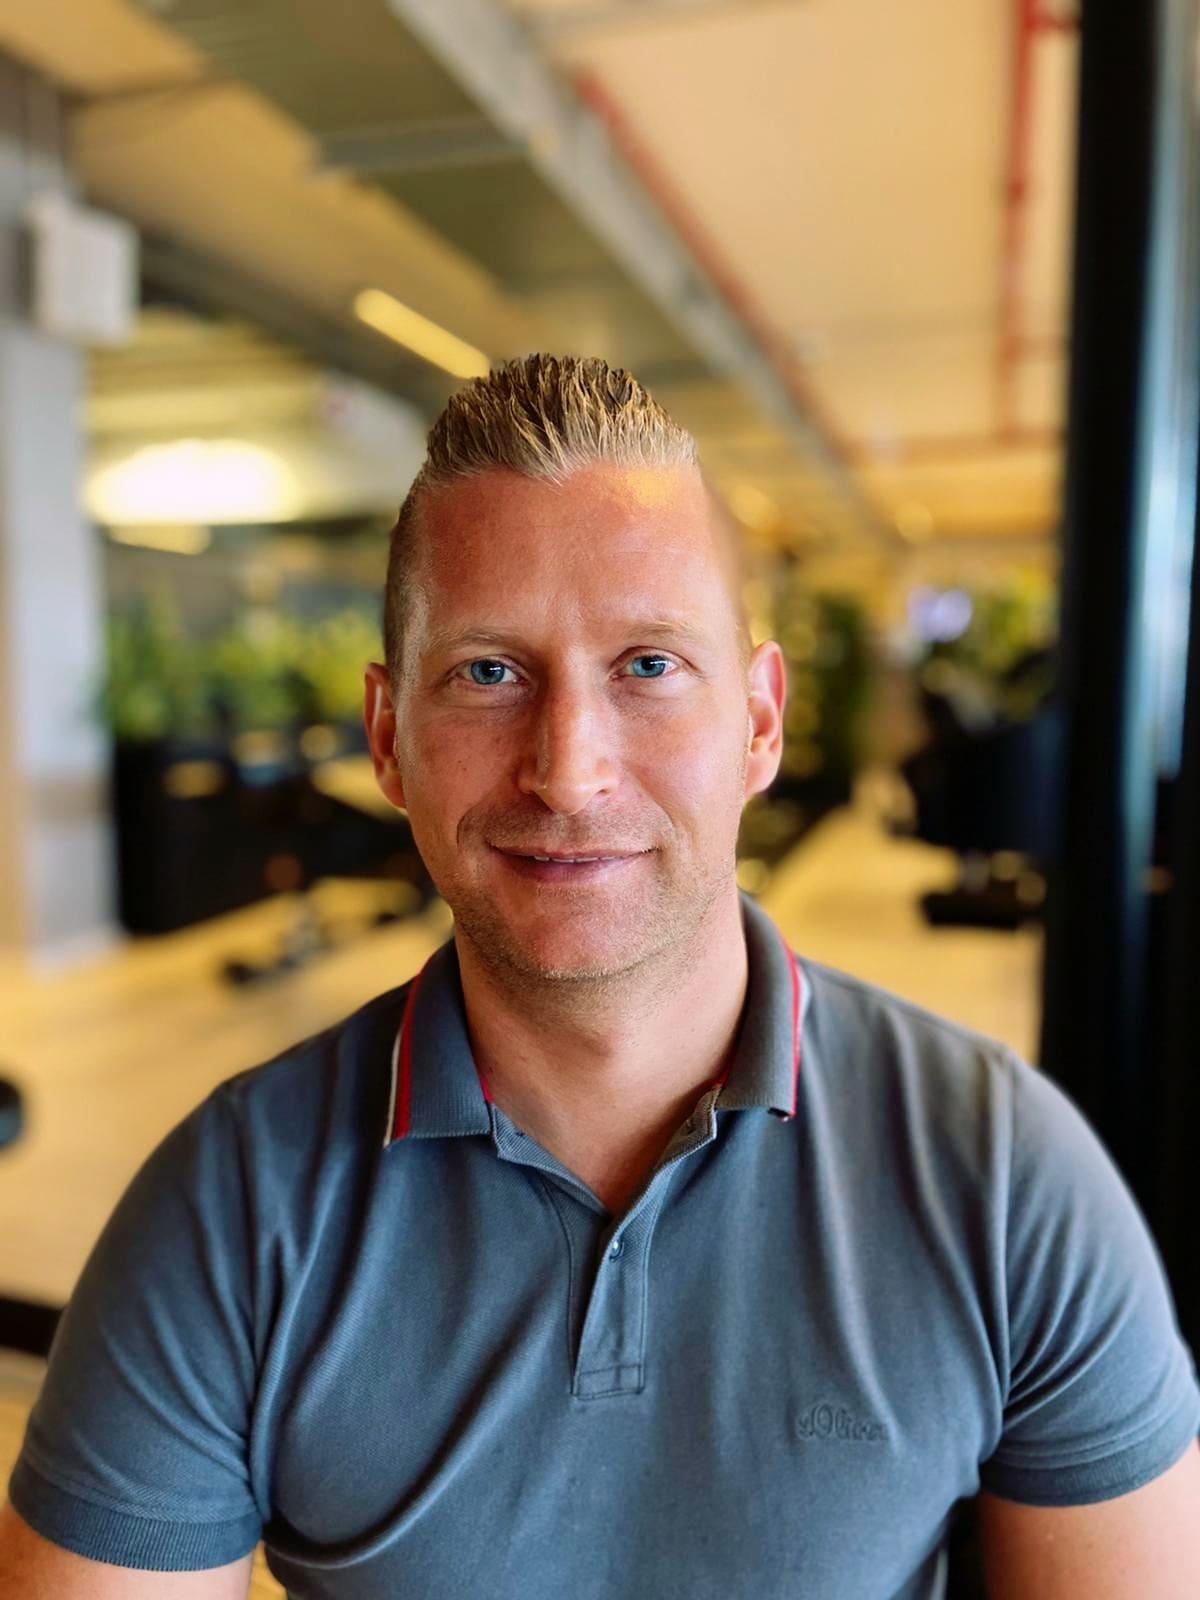 Jörg Rittmann Profil